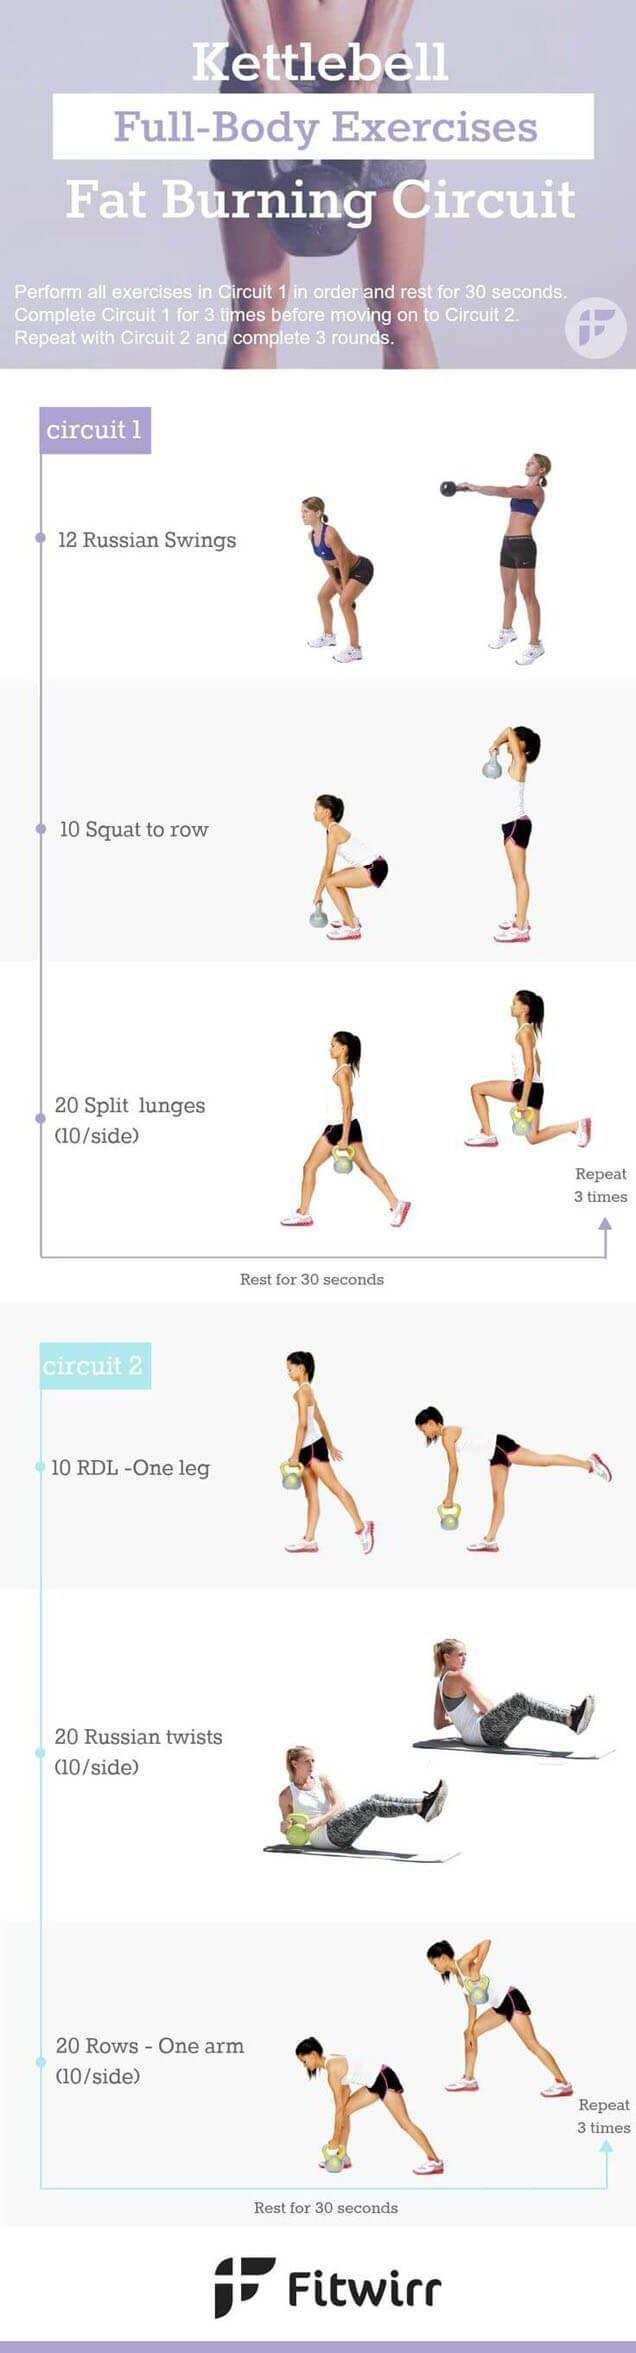 6 Kettlebell FAT BLASTING Workout Circuits. | Posted By: CustomWeightLossProgram.com https://www.kettlebellmaniac.com/kettlebell-exercises/ #Fullbodyworkouts